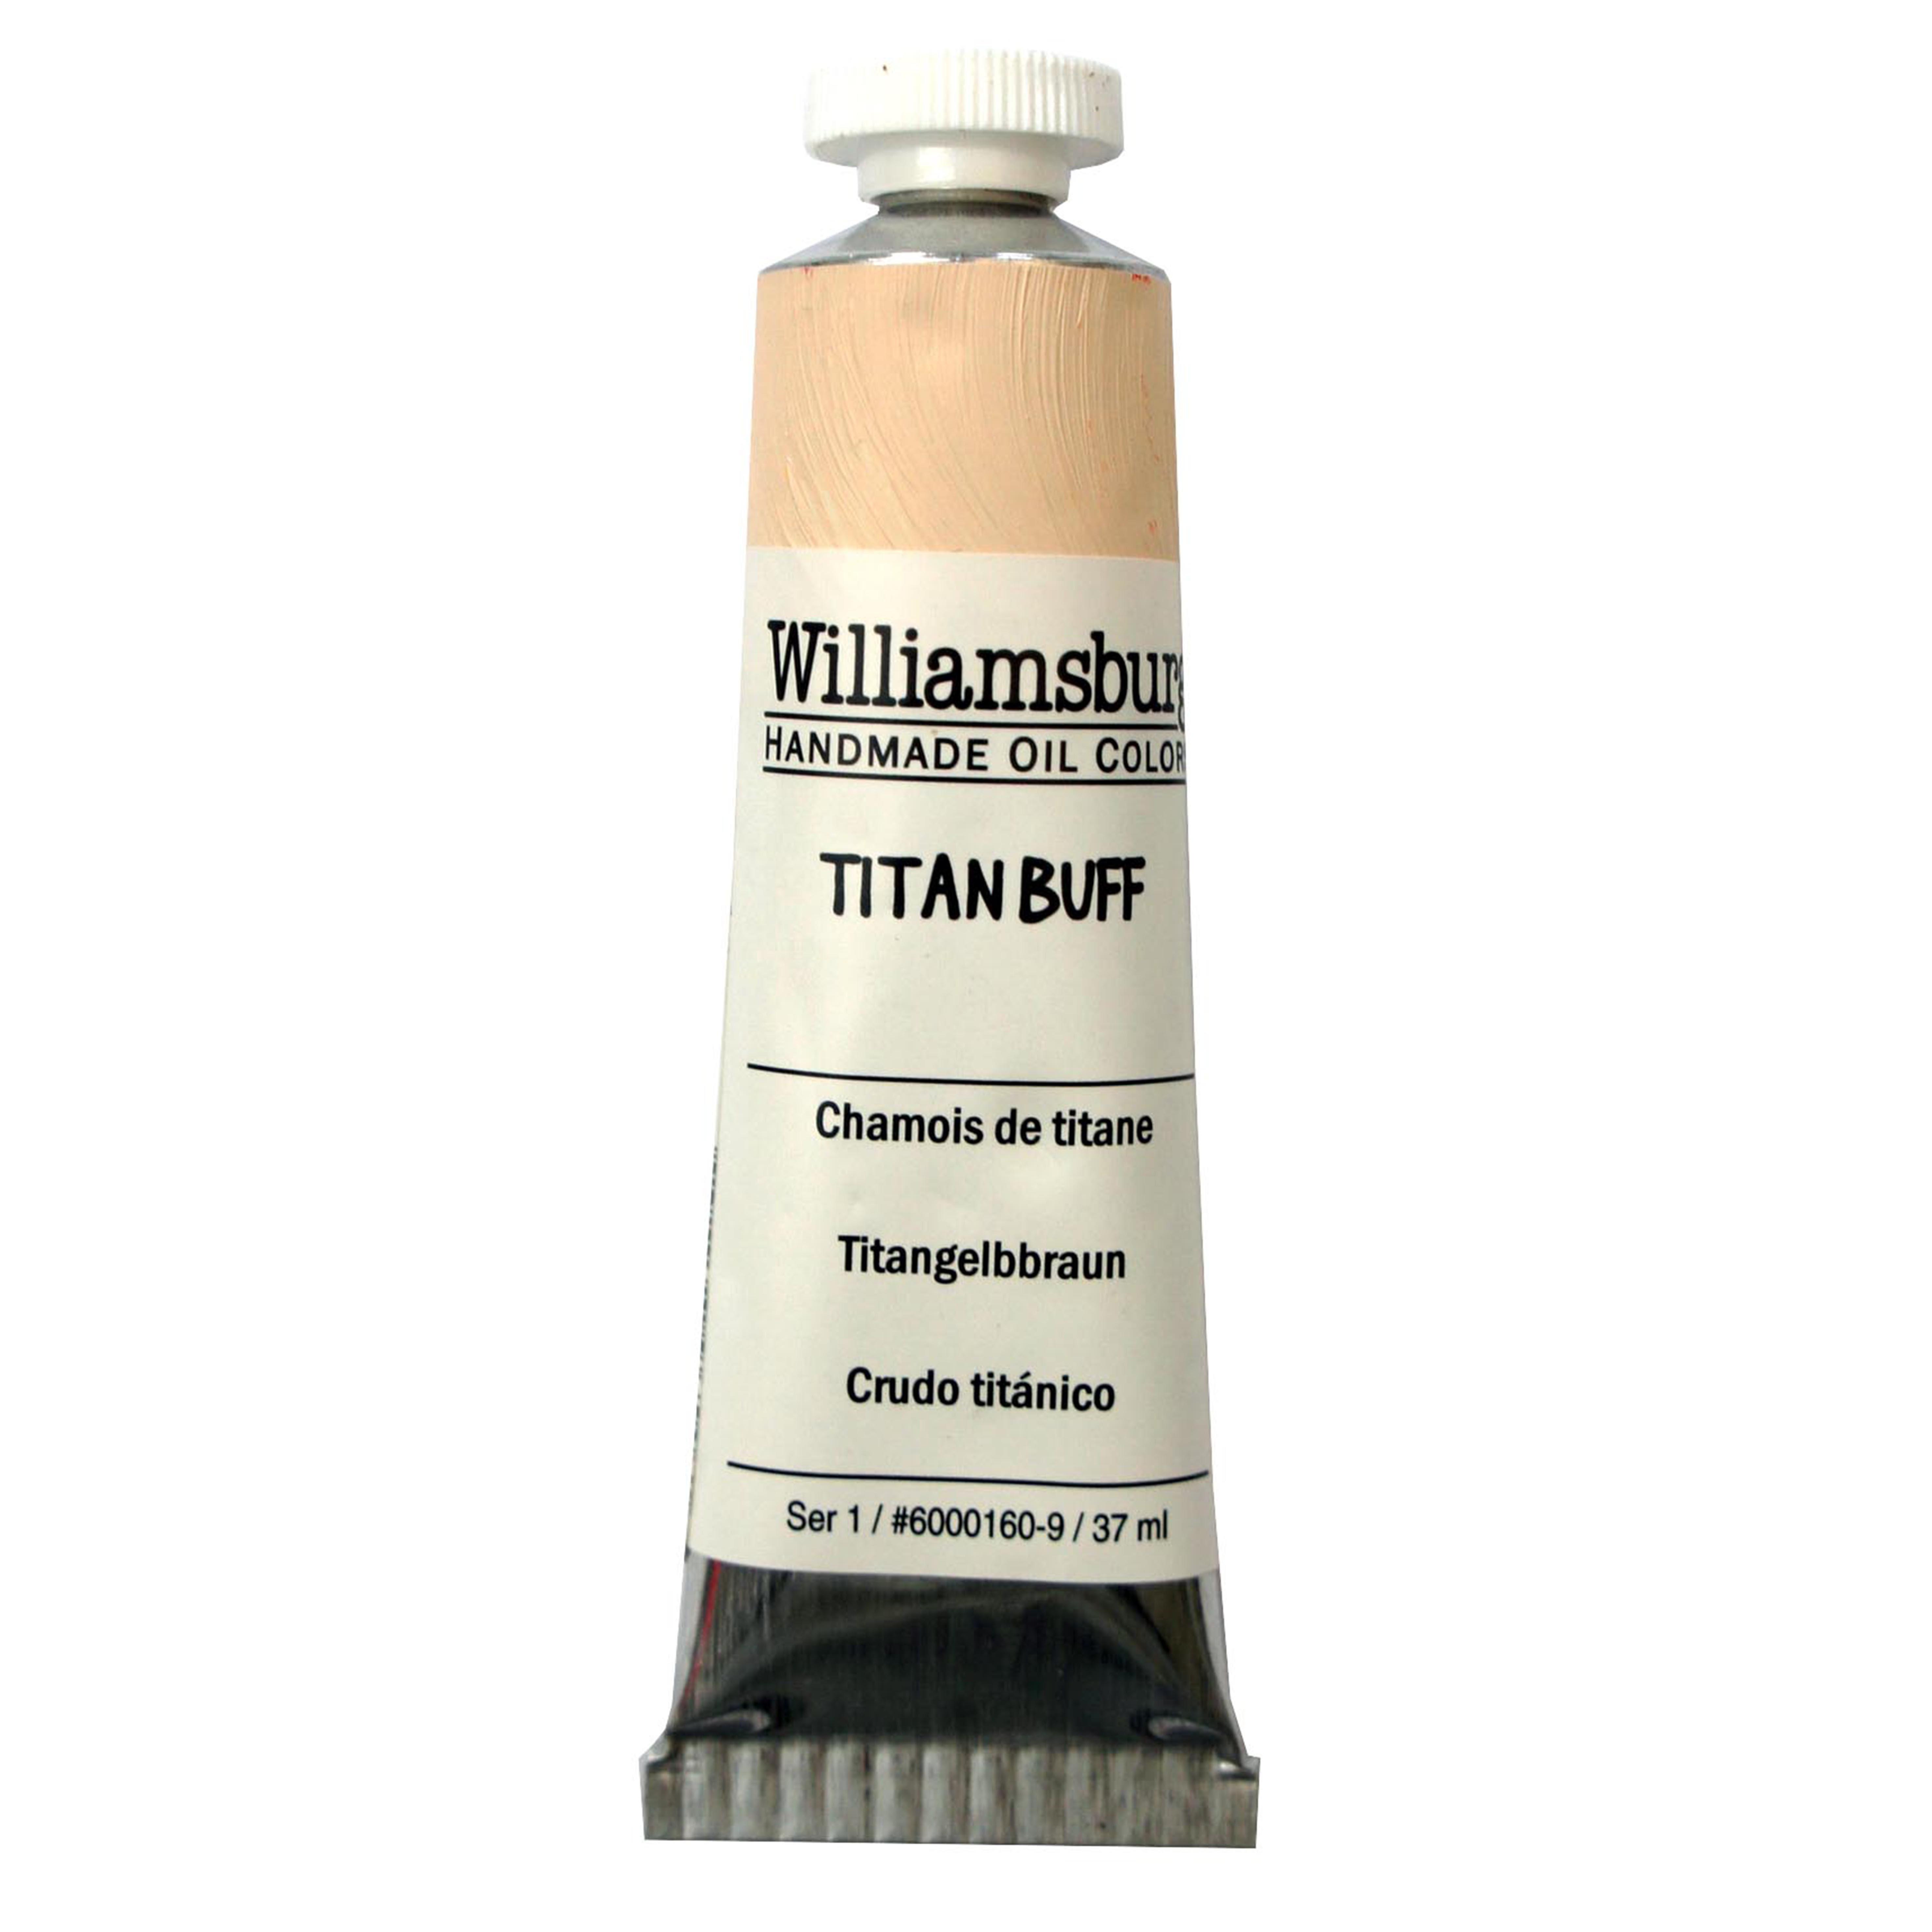 williamsburg titan buff london art shop buy art supplies